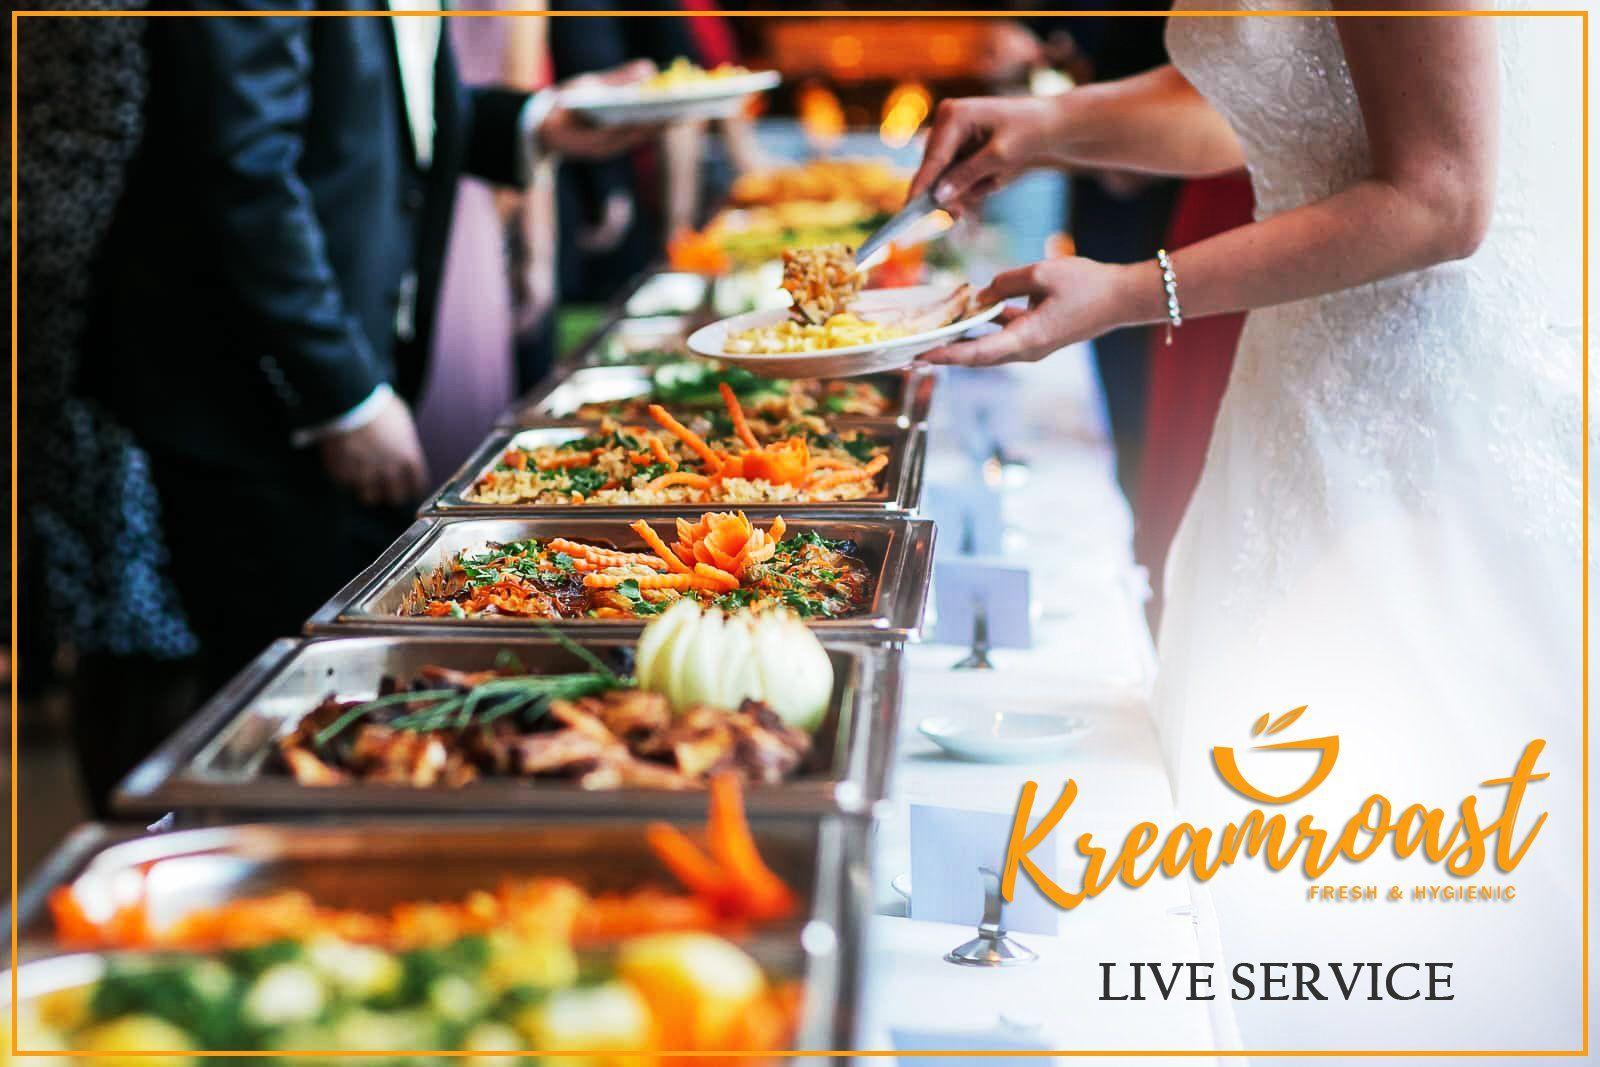 Kreamroast On Twitter In 2020 Wedding Catering Catering Vegan Wedding